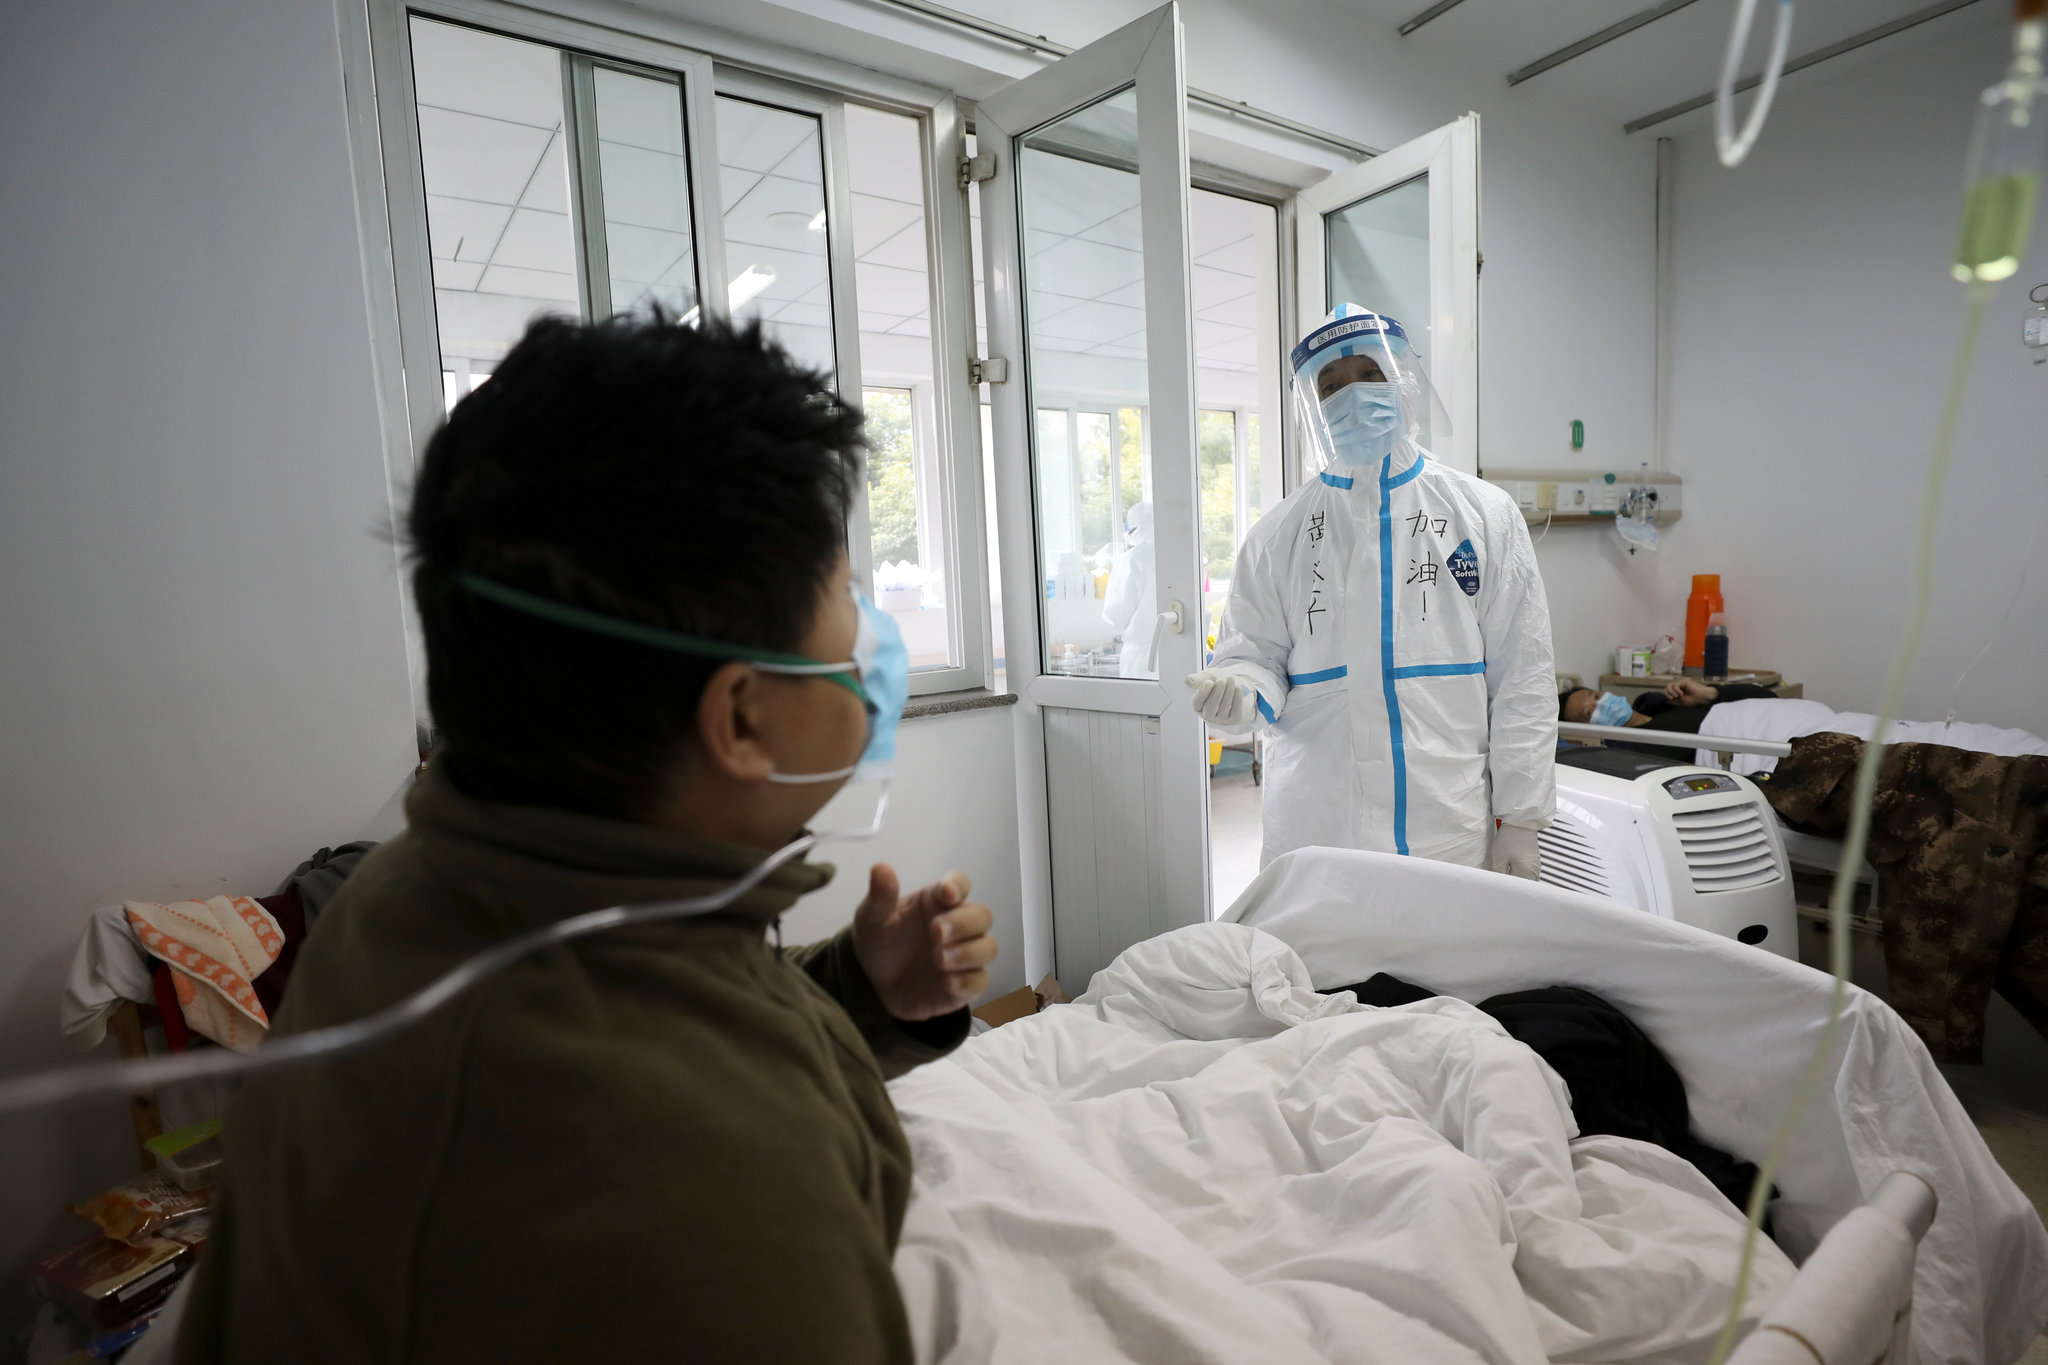 CHINA REPORTA HOSPITALIZACIÓN POR CONTAGIO DE CEPA DE GRIPE AVIAR